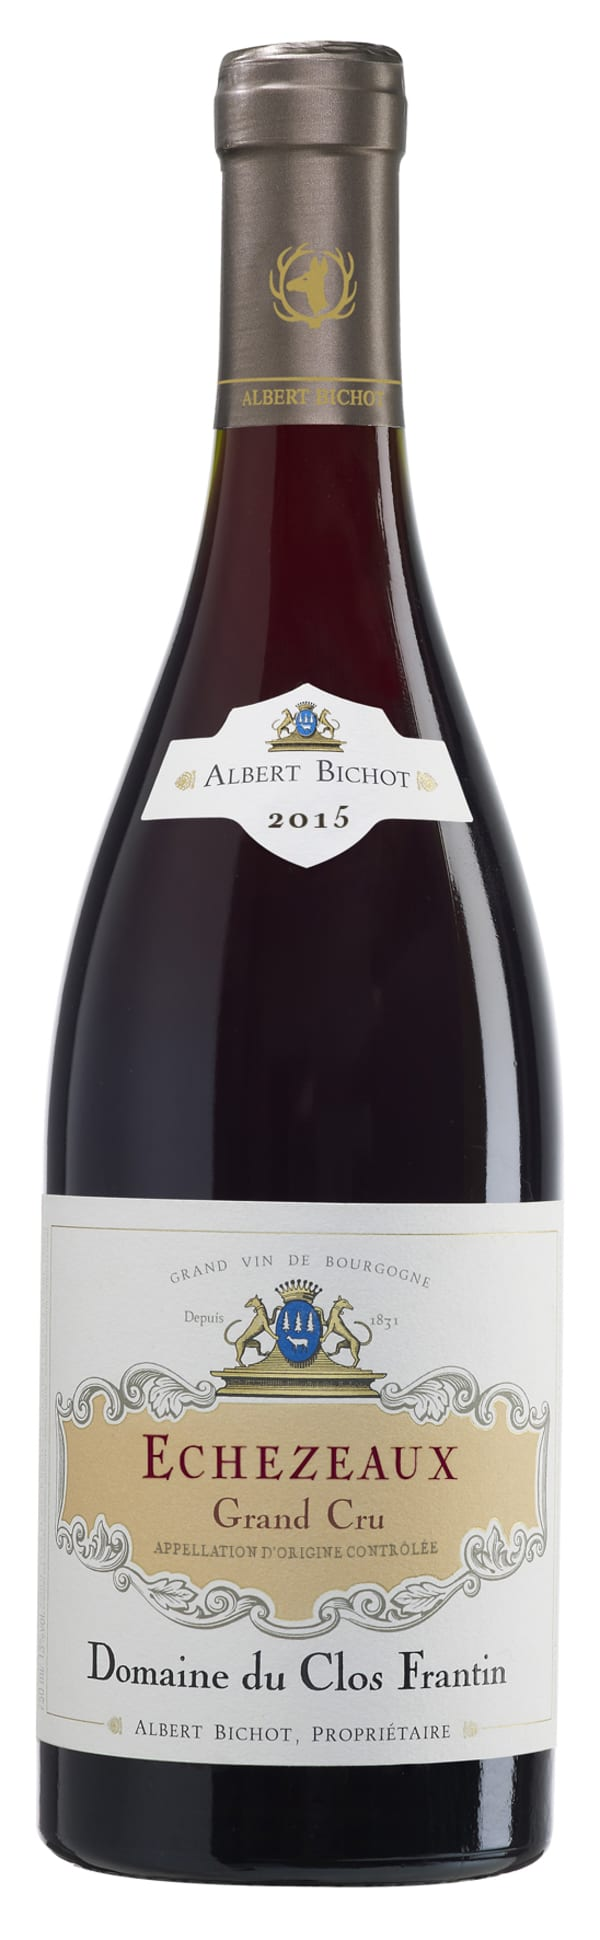 Albert Bichot Domaine du Clos Frantin Echezeaux Grand Cru  2015